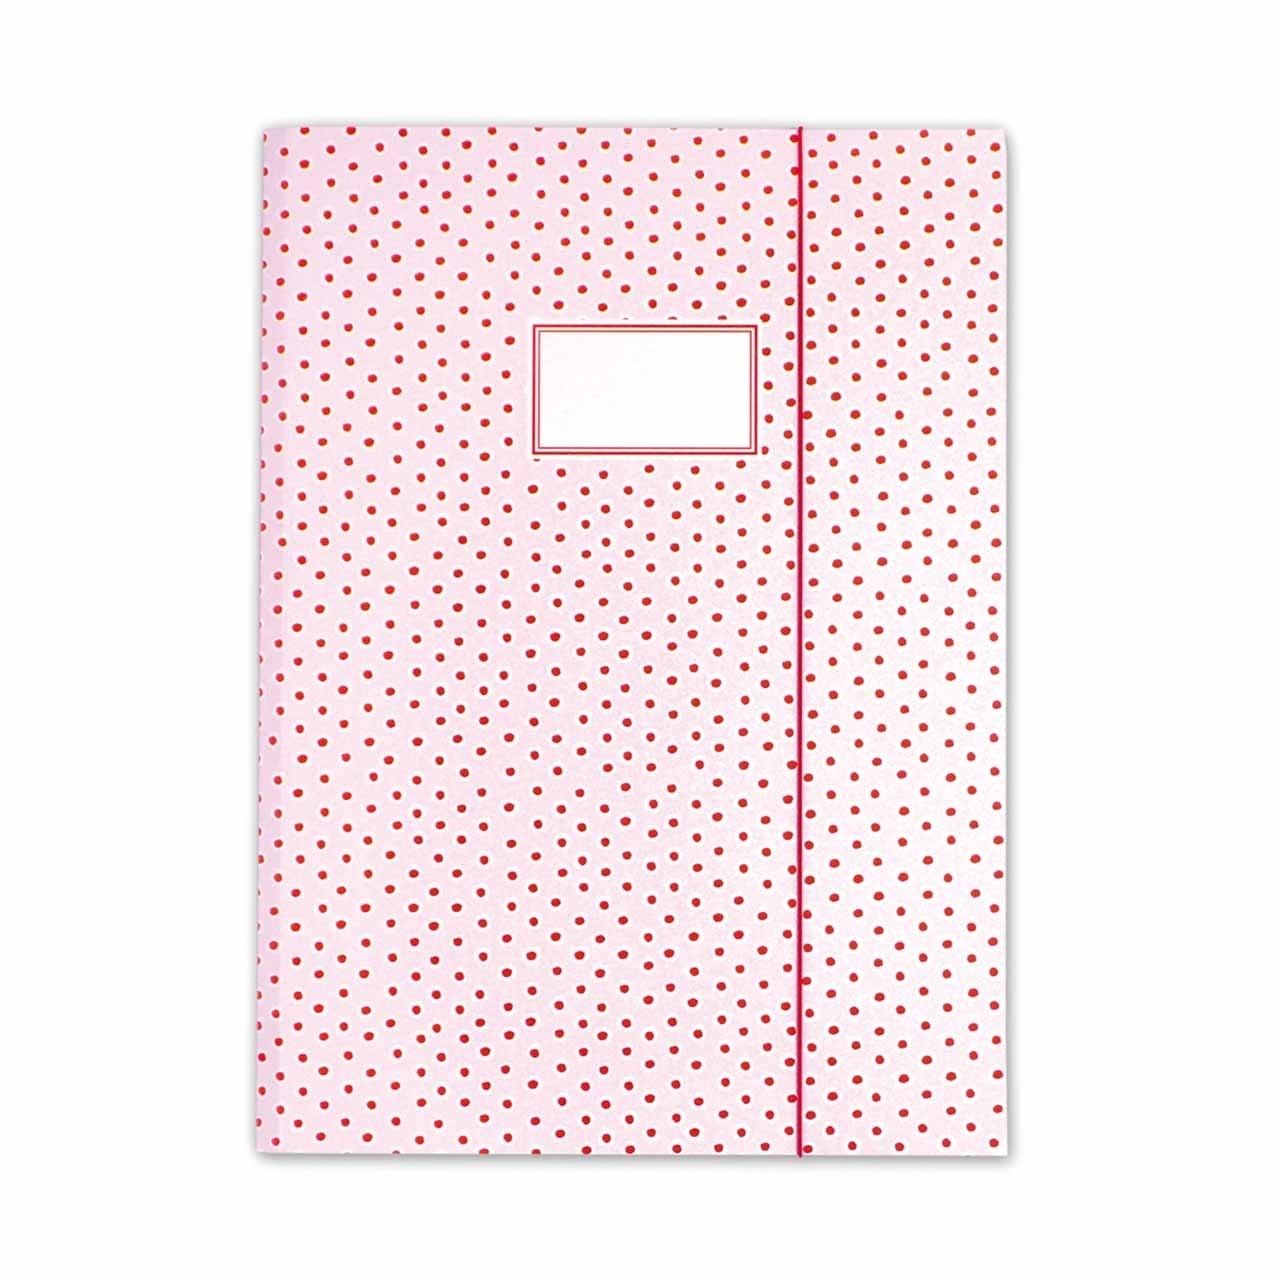 Sammelmappe Tupfen Rosa A3 | KrimaundIsa Notizhefte & Mappen ...